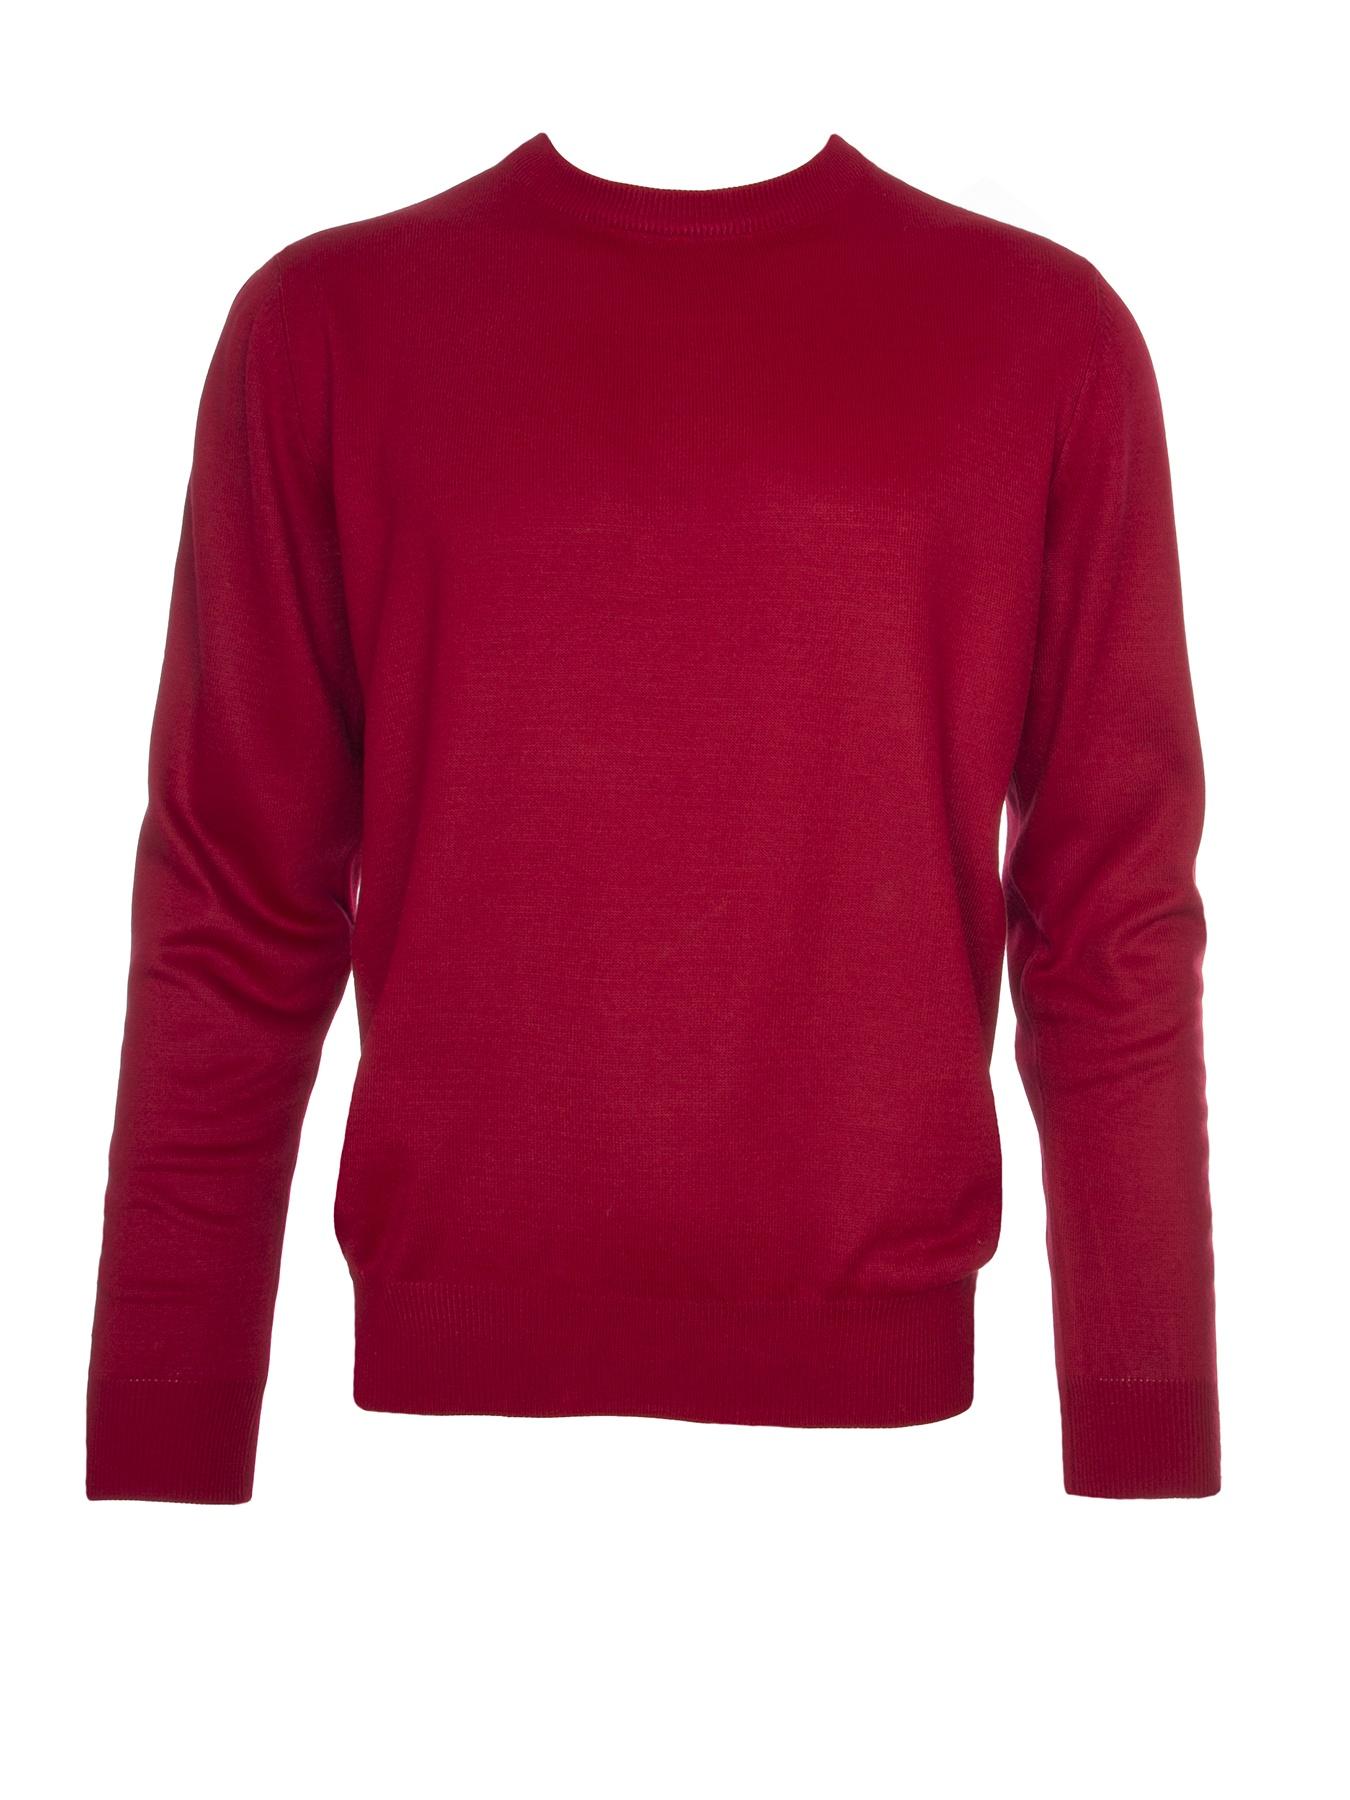 Джемпер Rabsido джемпер мужской mustang cable knit jumper цвет темно сиий 1006947 5334 размер l 50 52